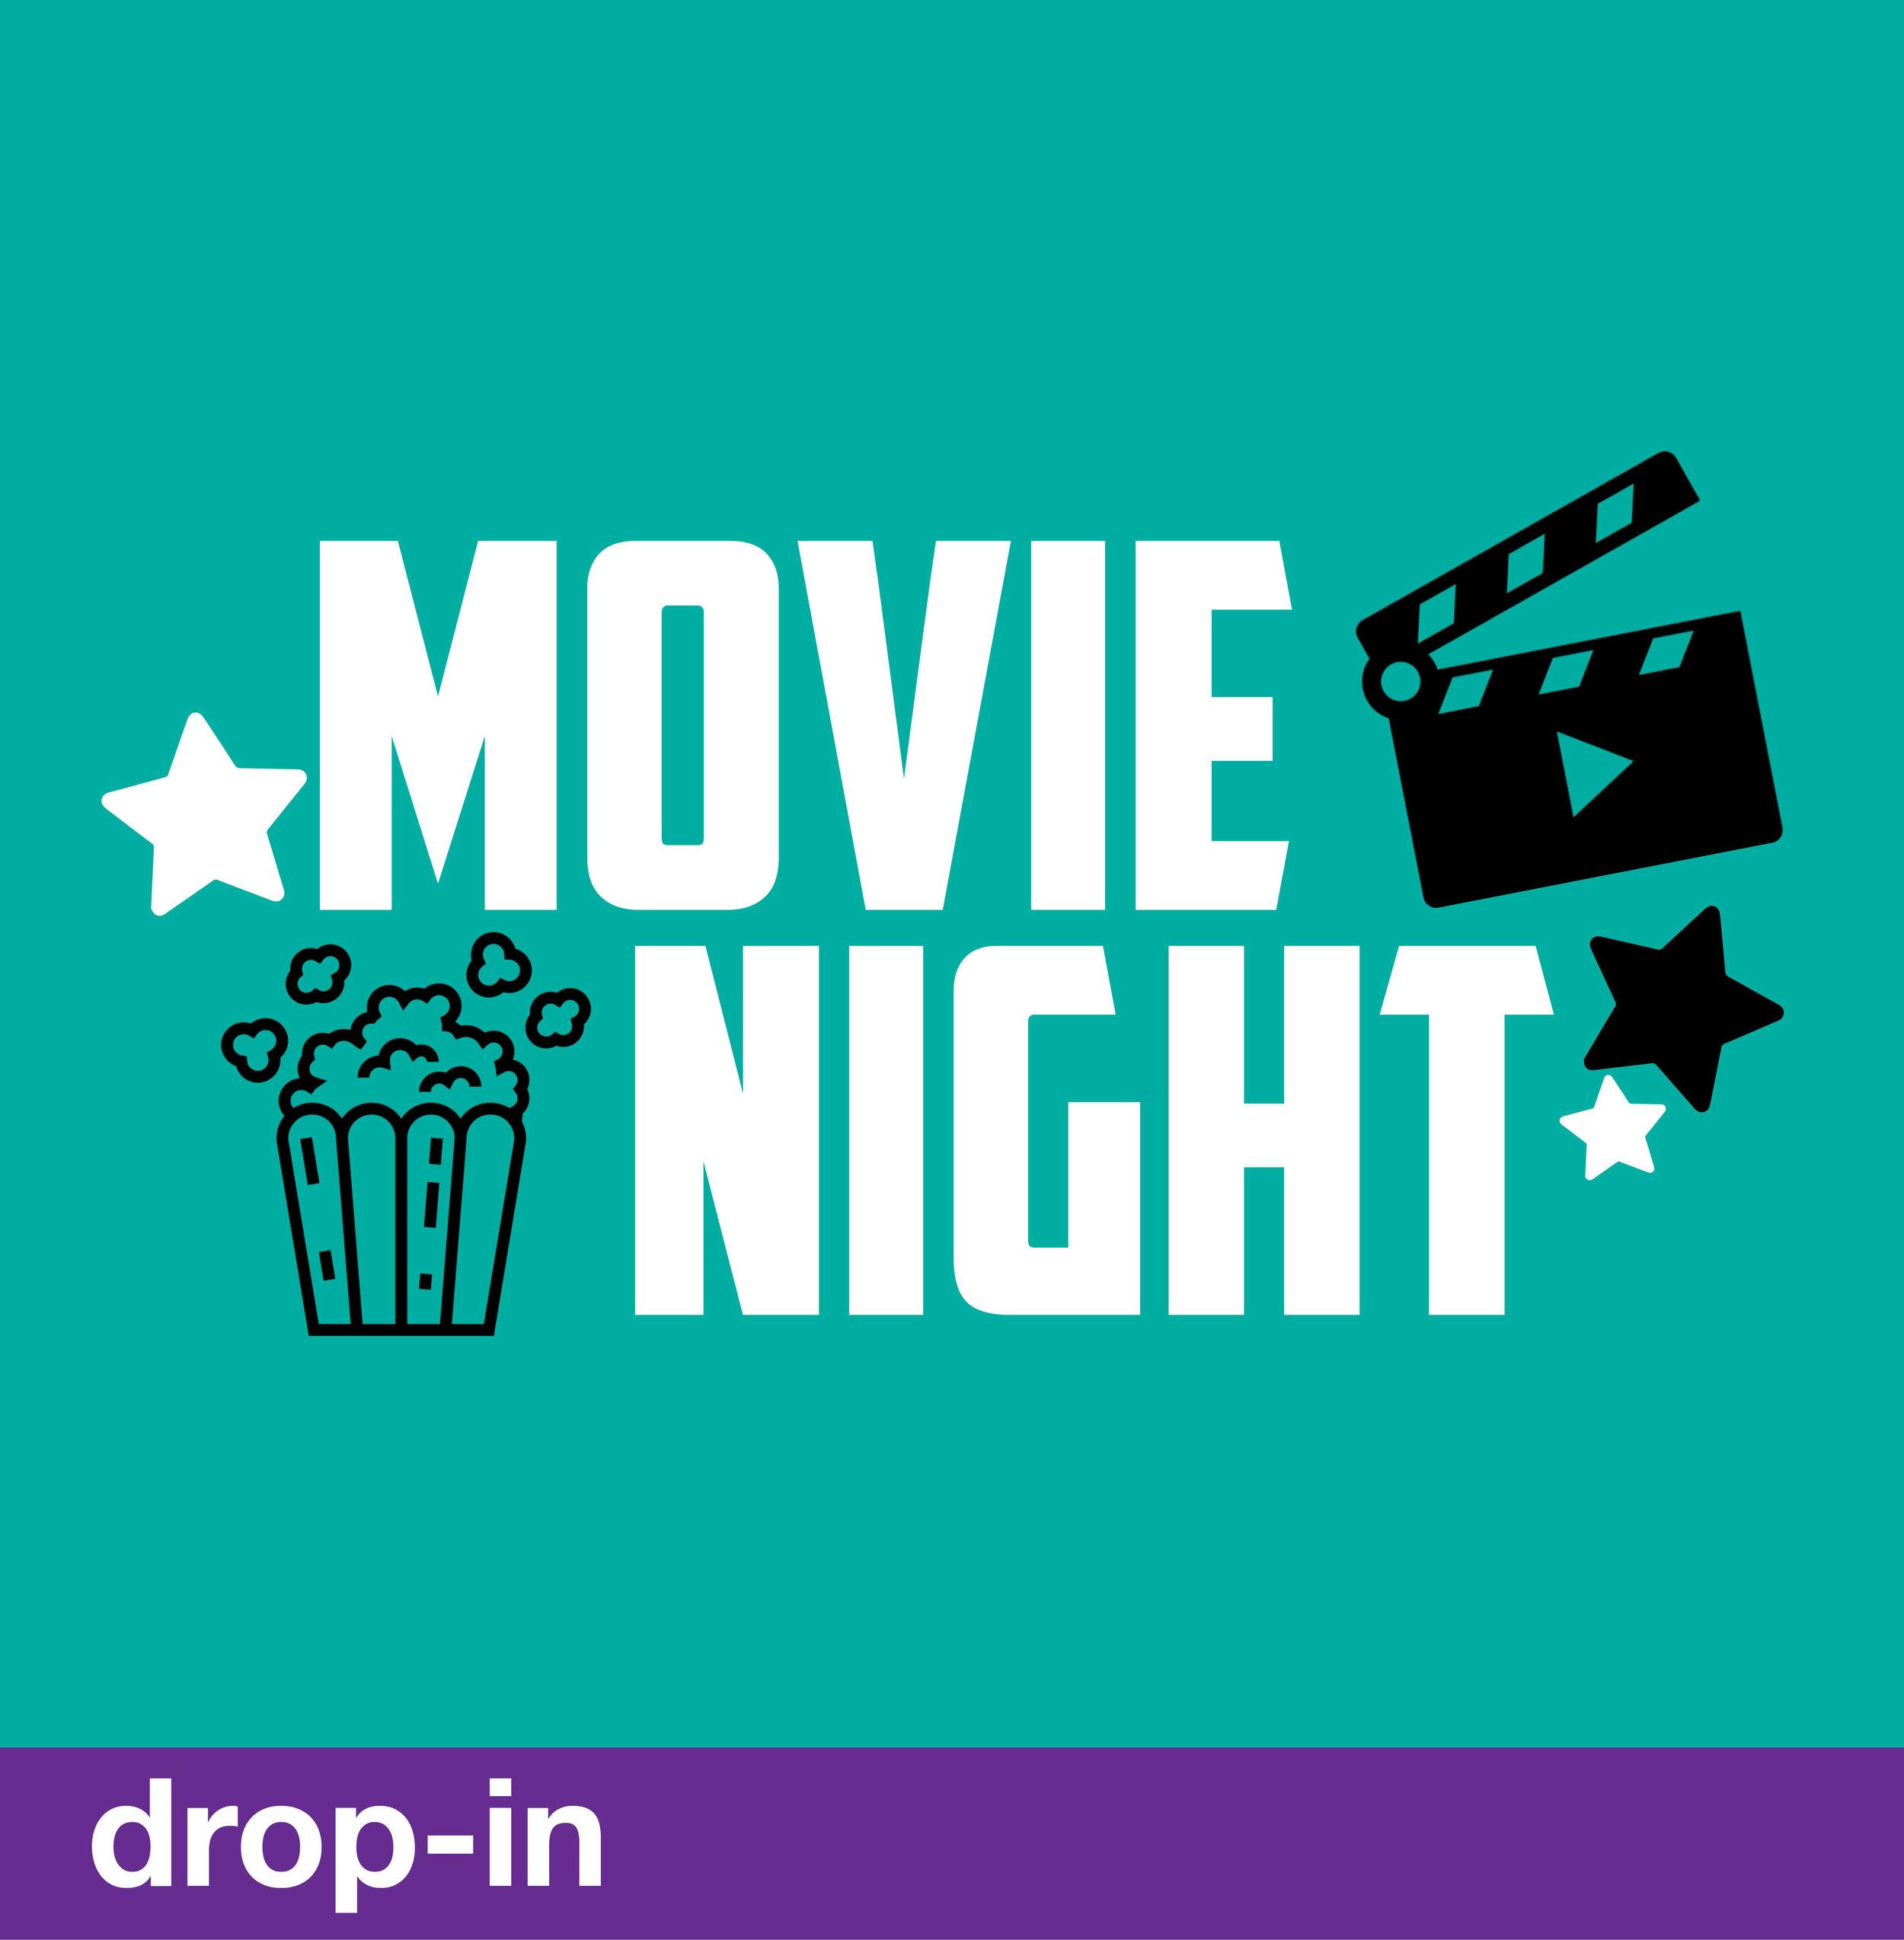 SQM movie night.jpg